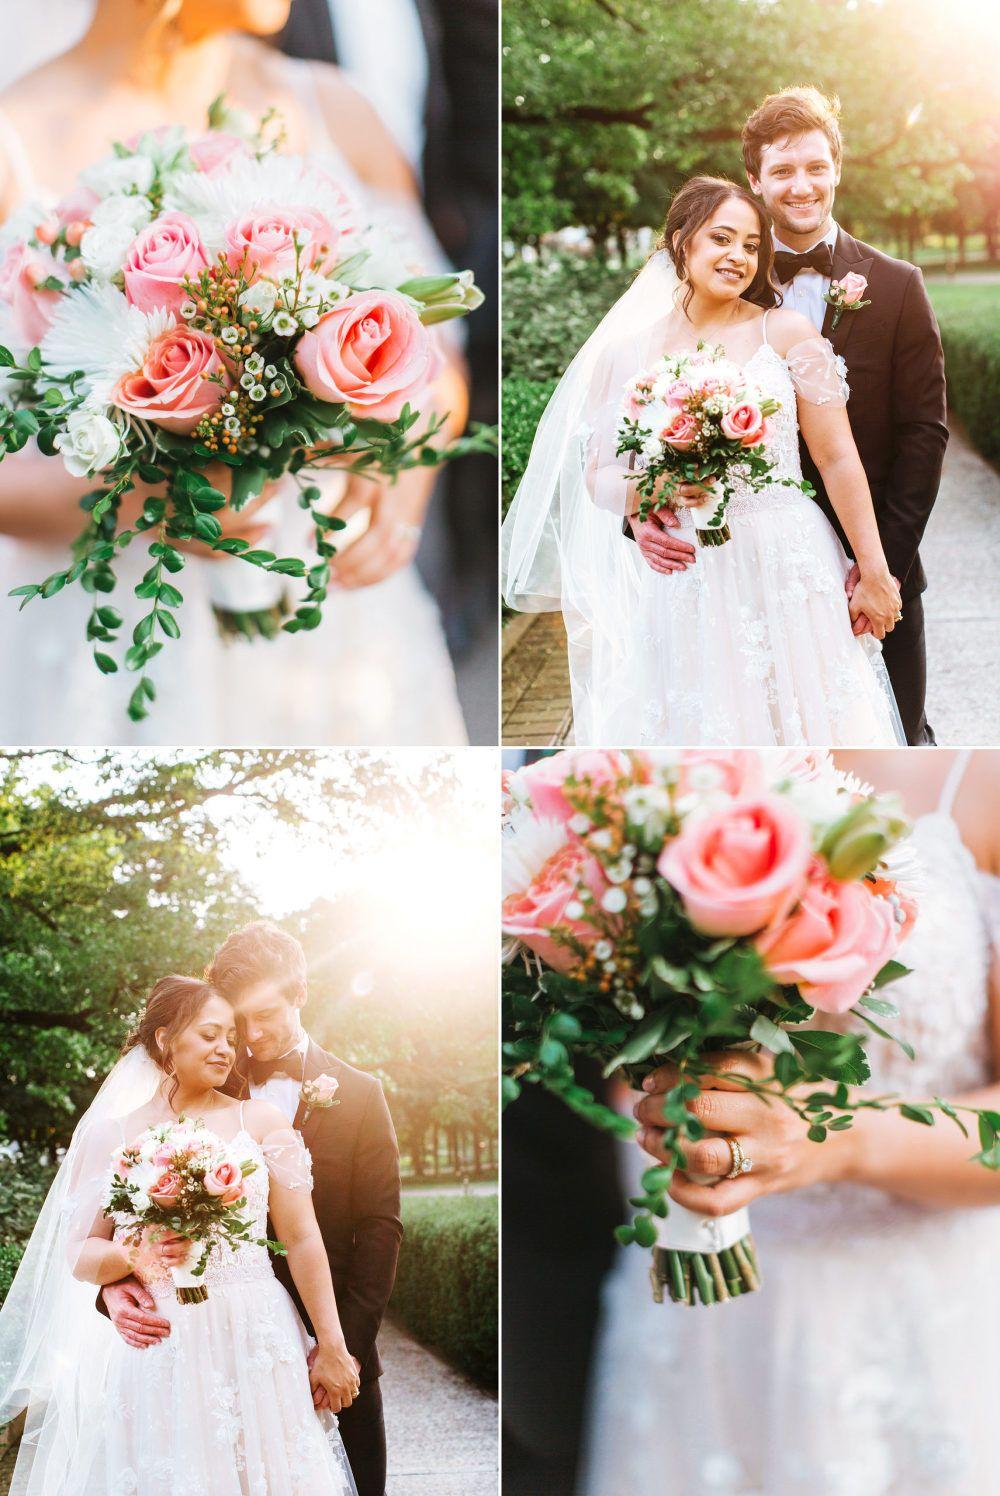 Haella + Collin Franklin Park Conservatory Wedding » Red